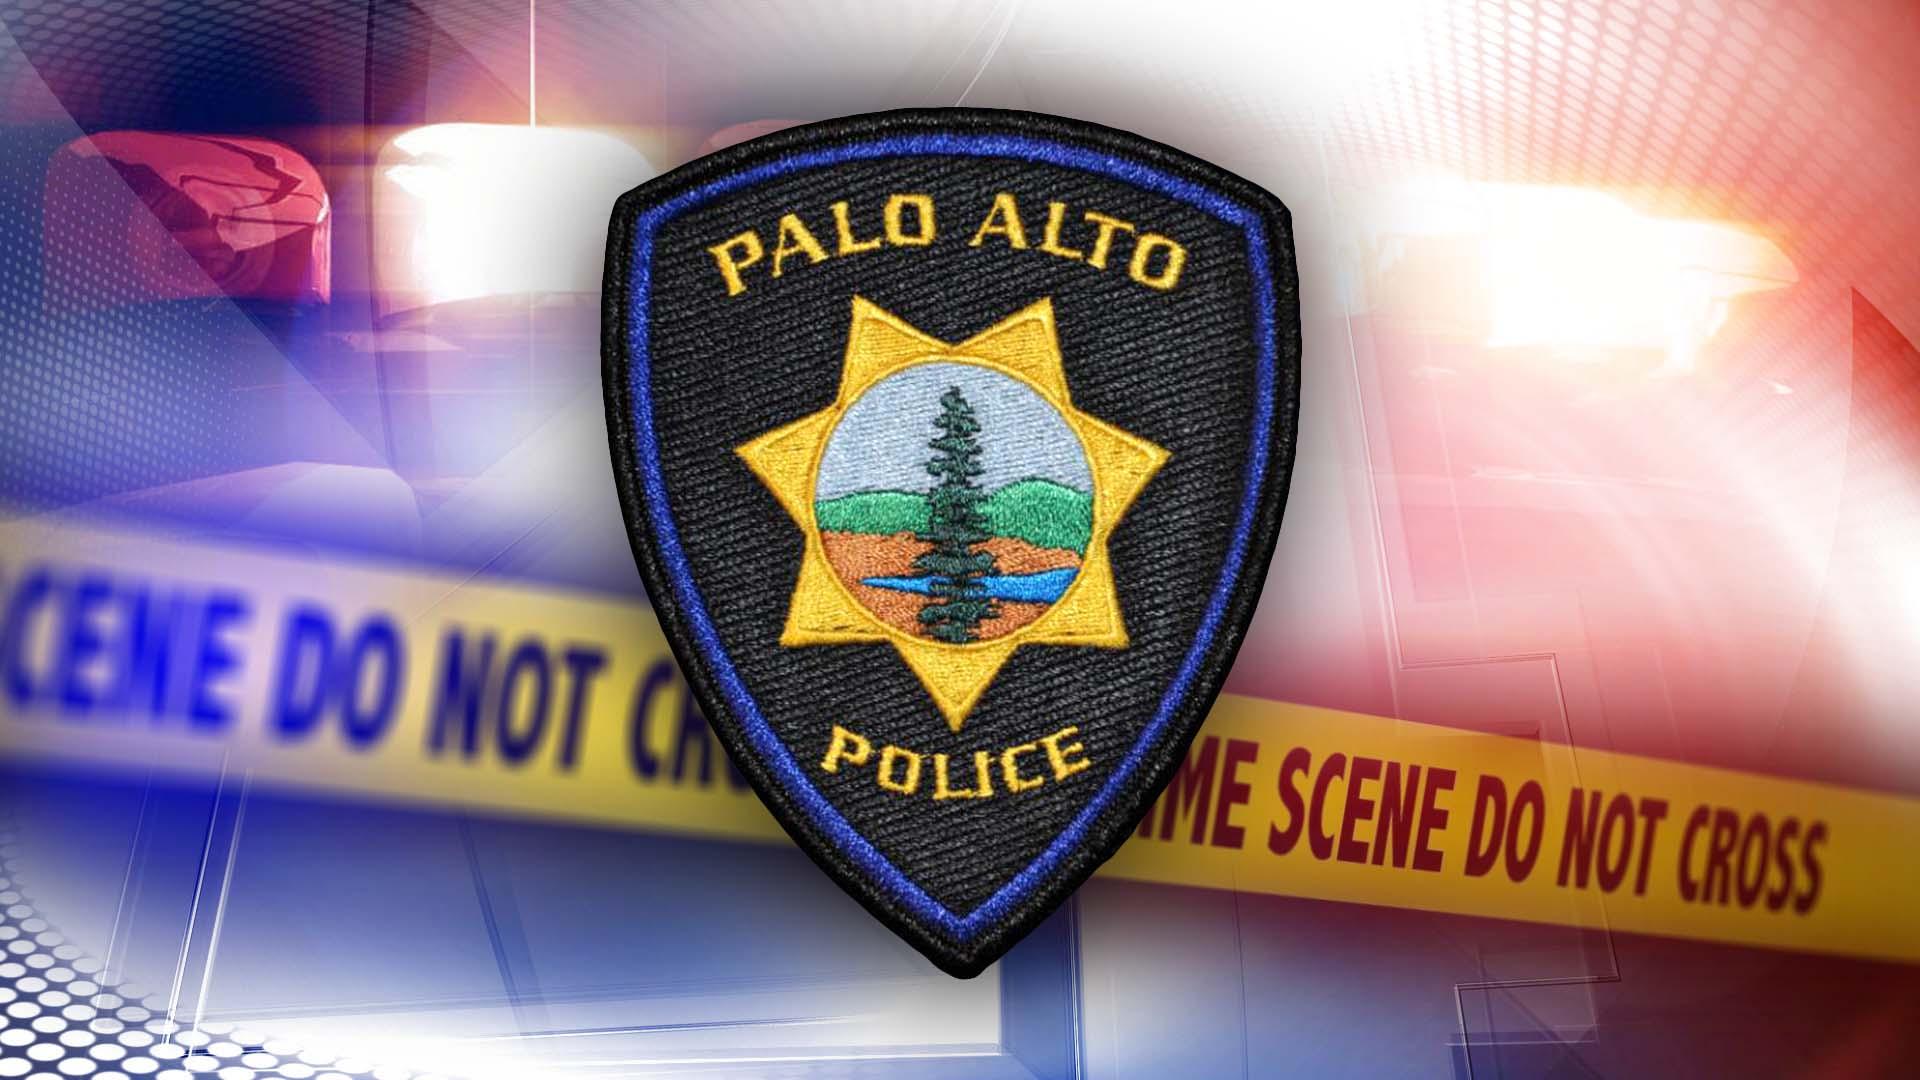 graphic FS Police Palo Alto police_1523150832429.jpg.jpg